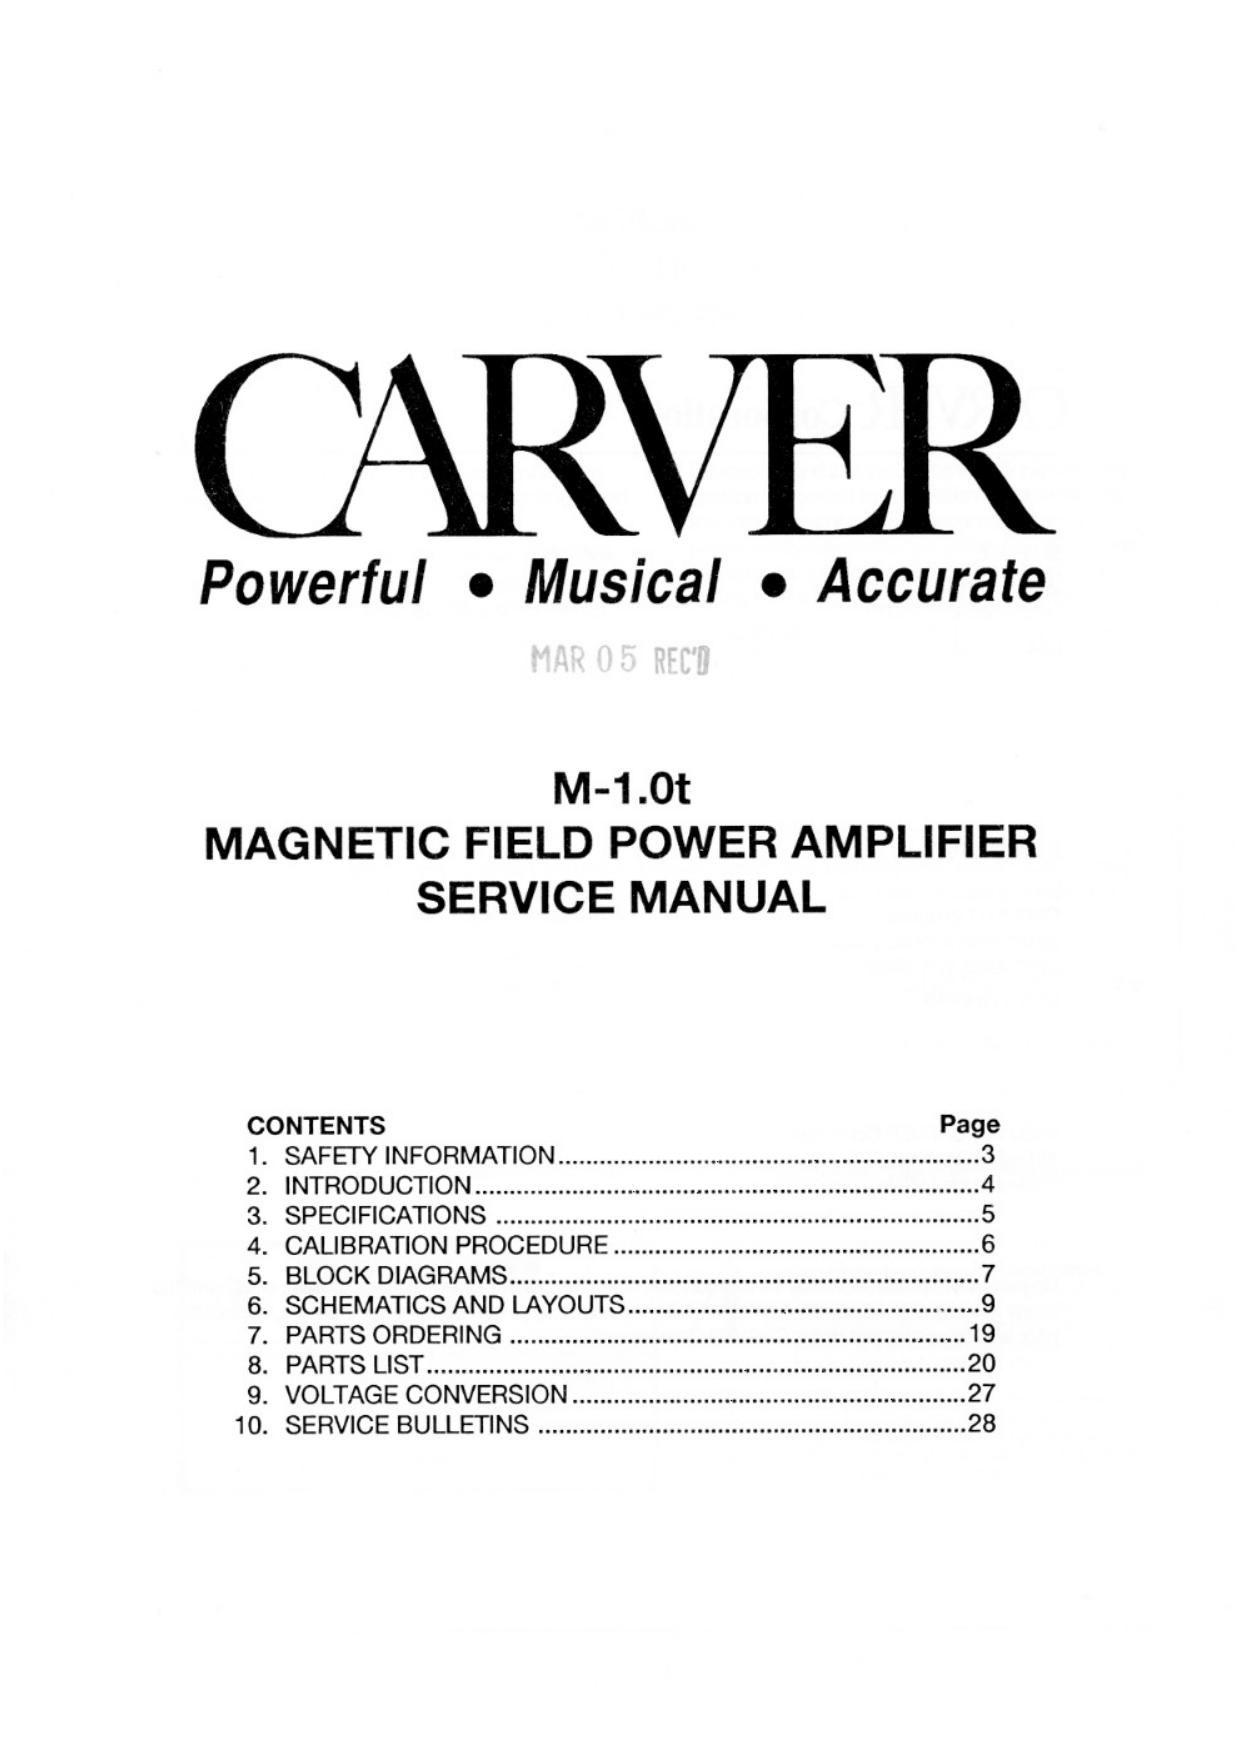 carver m1 0t service manual rh audioservicemanuals com career service manual pasco county carver service manual dtl-200-mkii